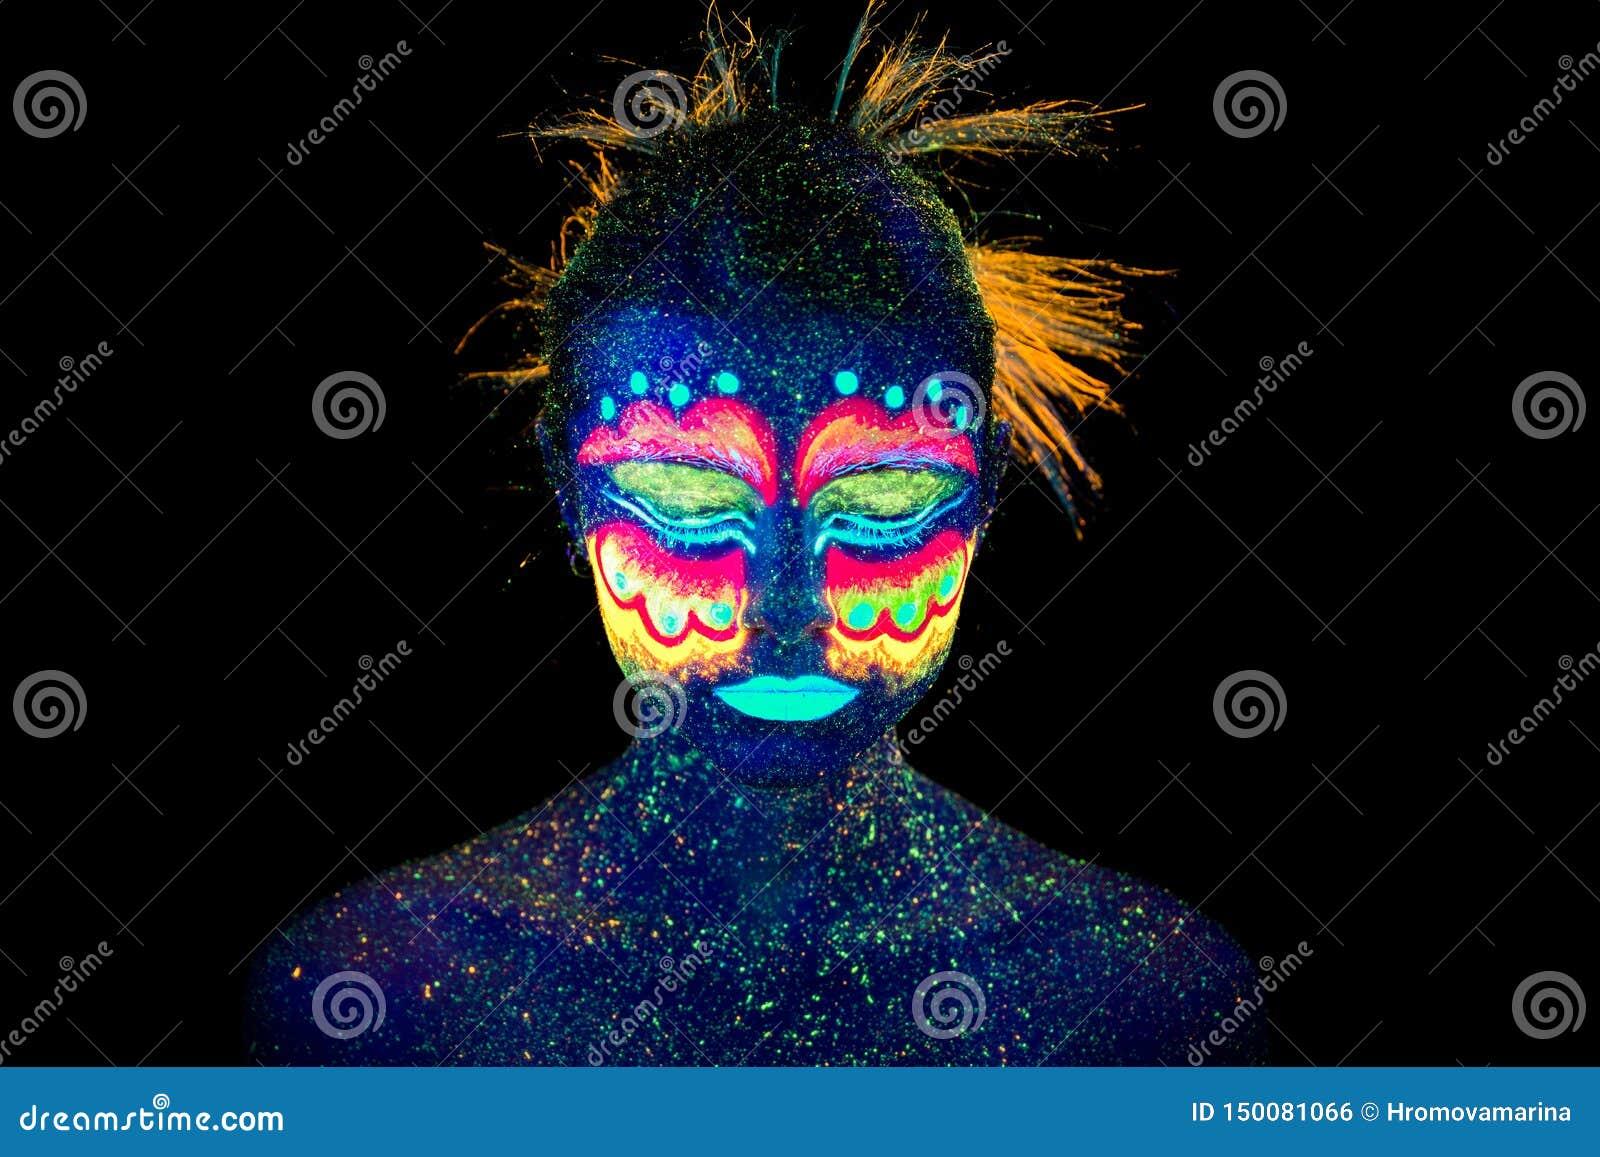 Blue woman portrait, aliens sleeps, ultraviolet make-up. Beautiful on a dark background.